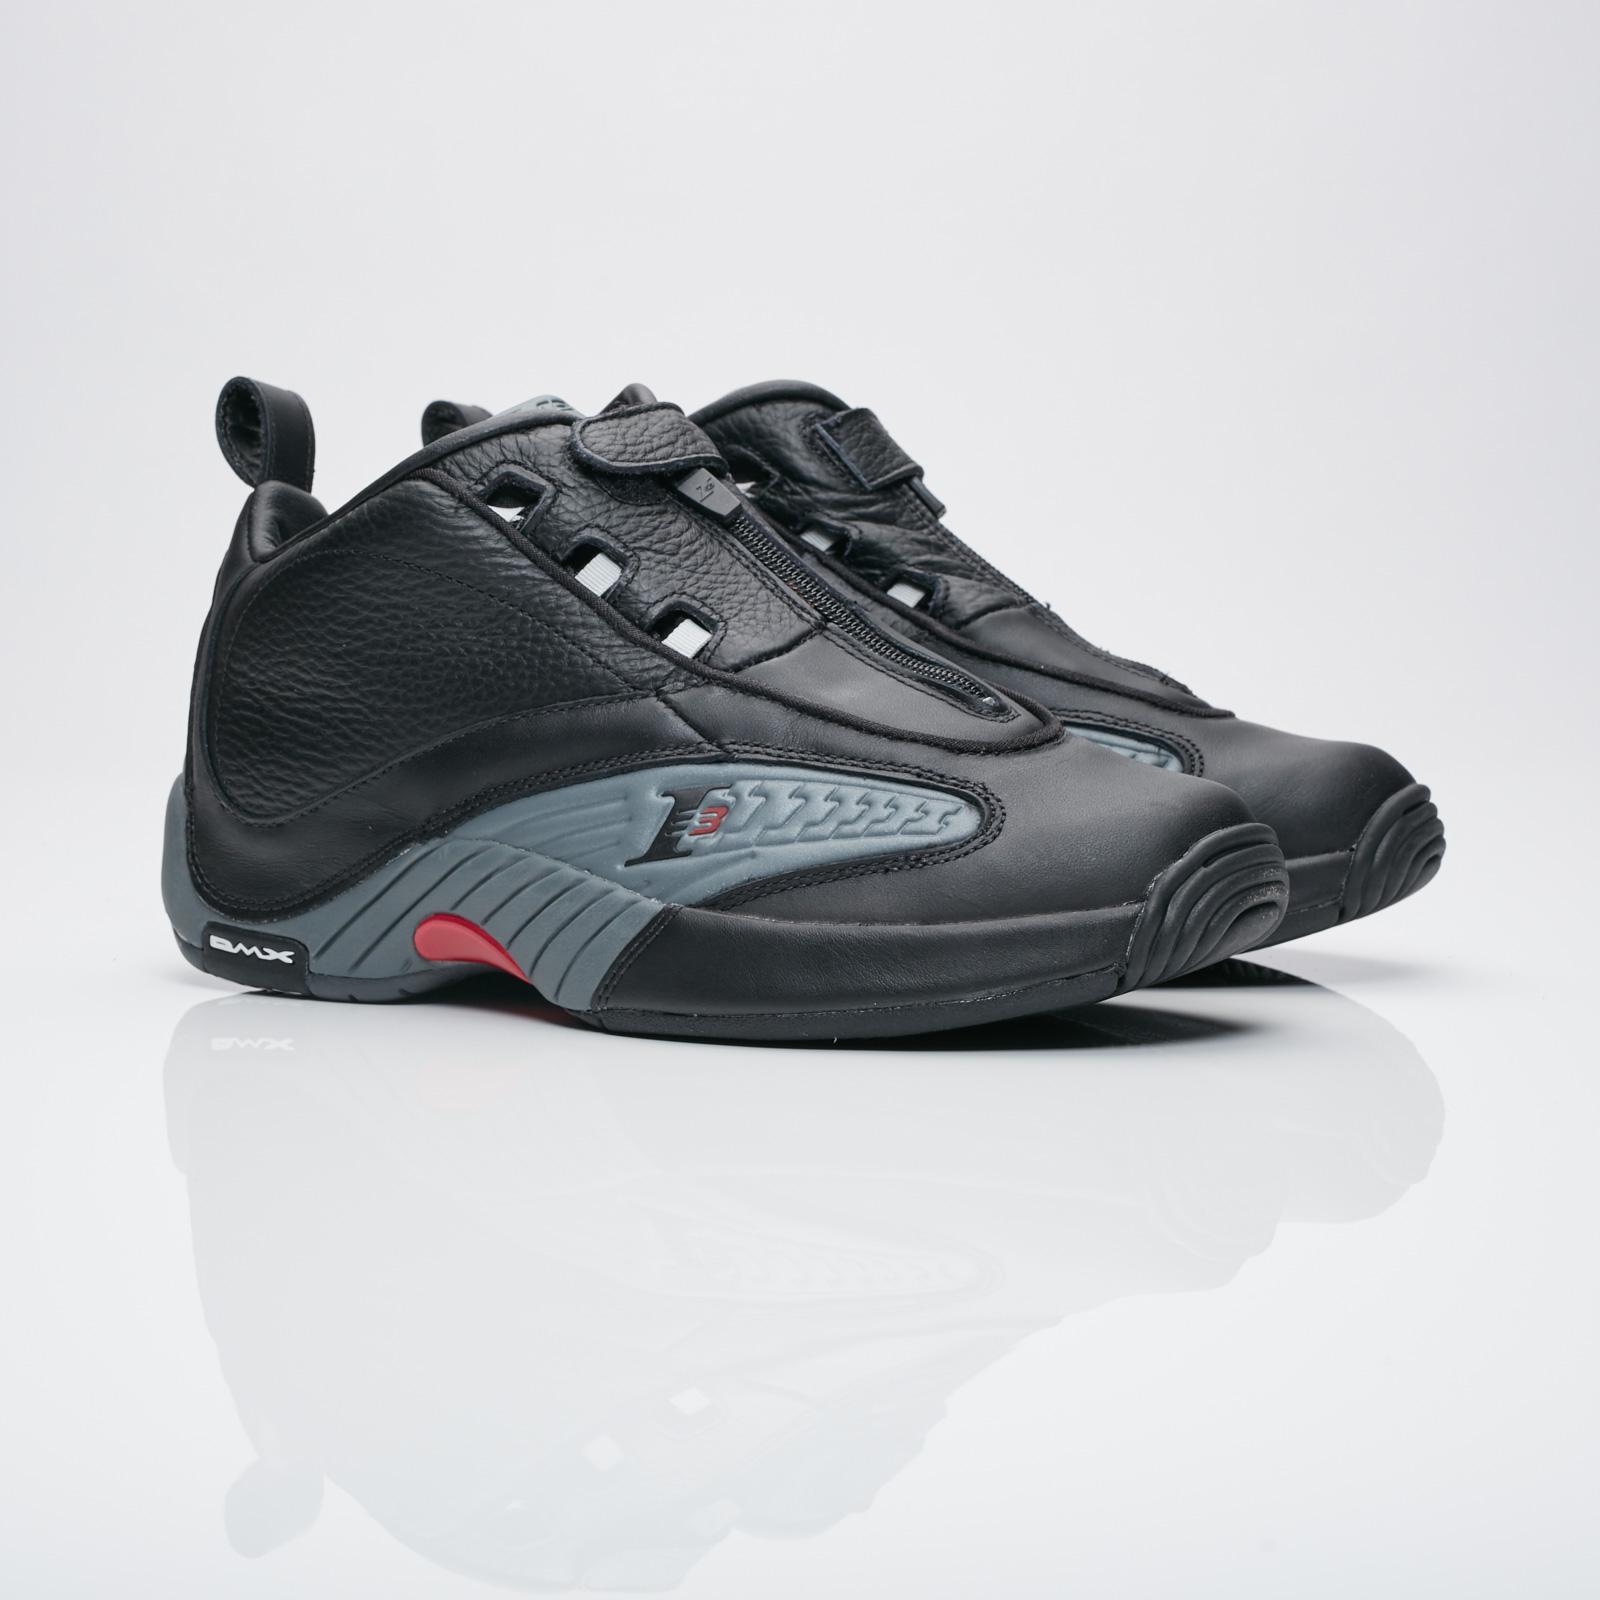 Reebok Answer IV - V44961 - Sneakersnstuff | sneakers ...